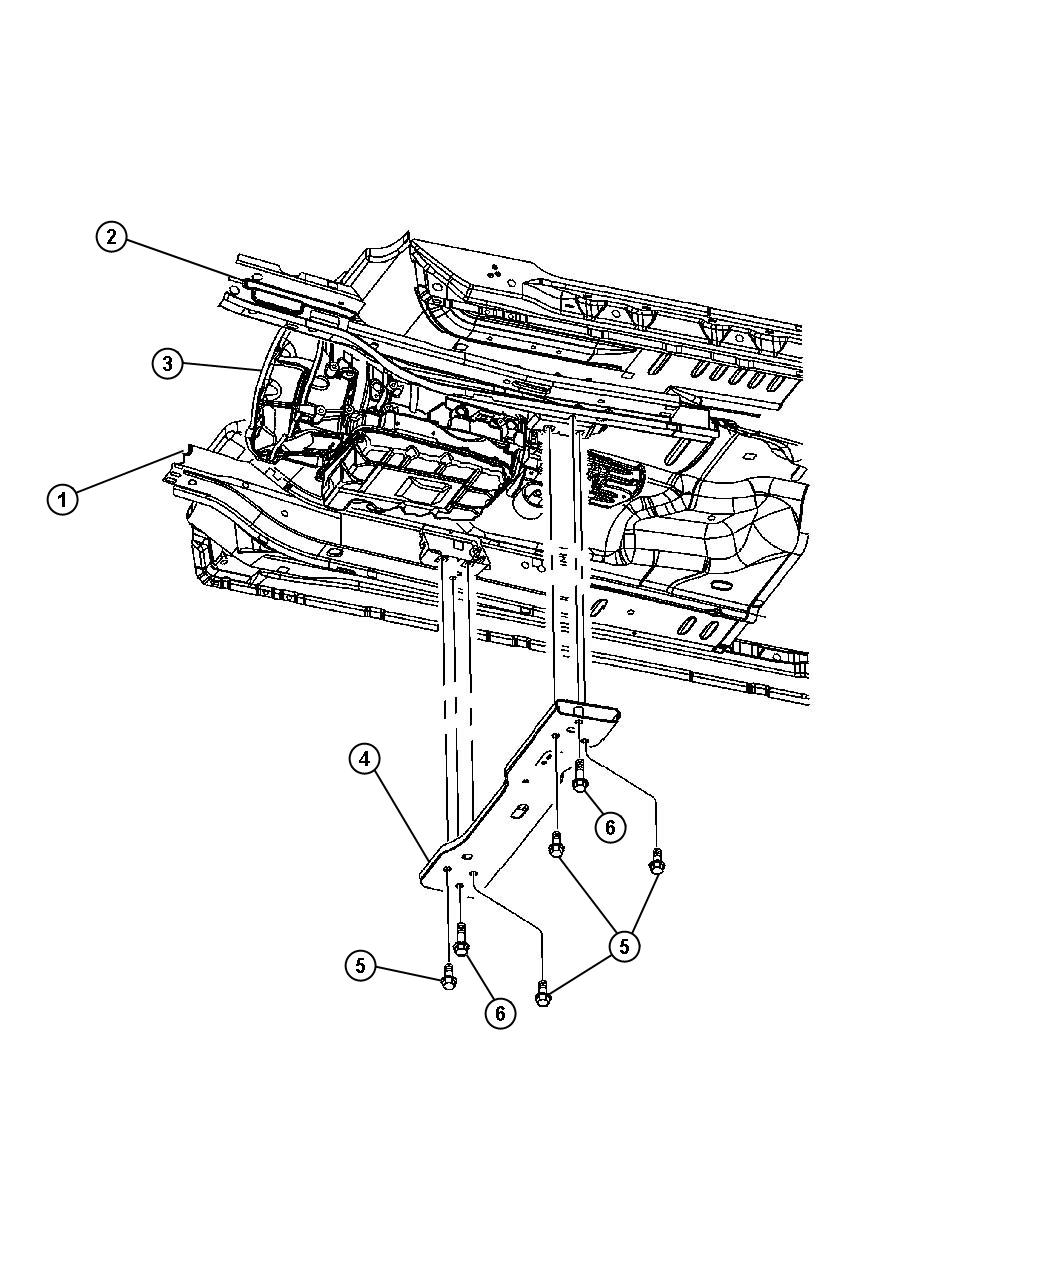 Jeep Liberty Screw Mounting Inboard Crossmember